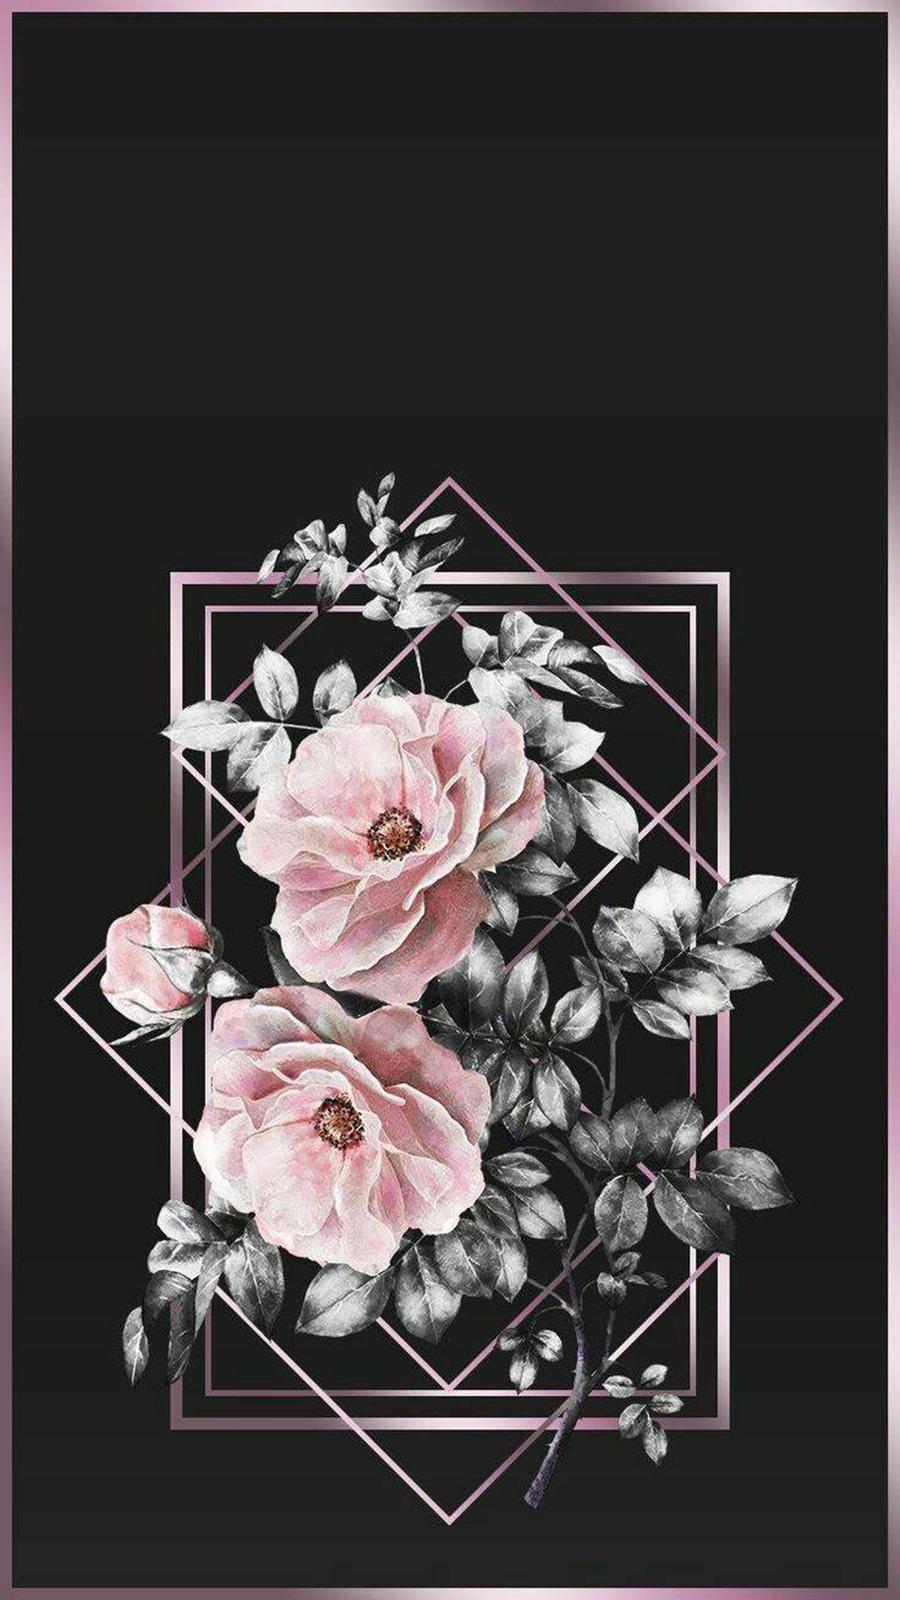 Rose & Black 4K Free Wallpapers Now Download